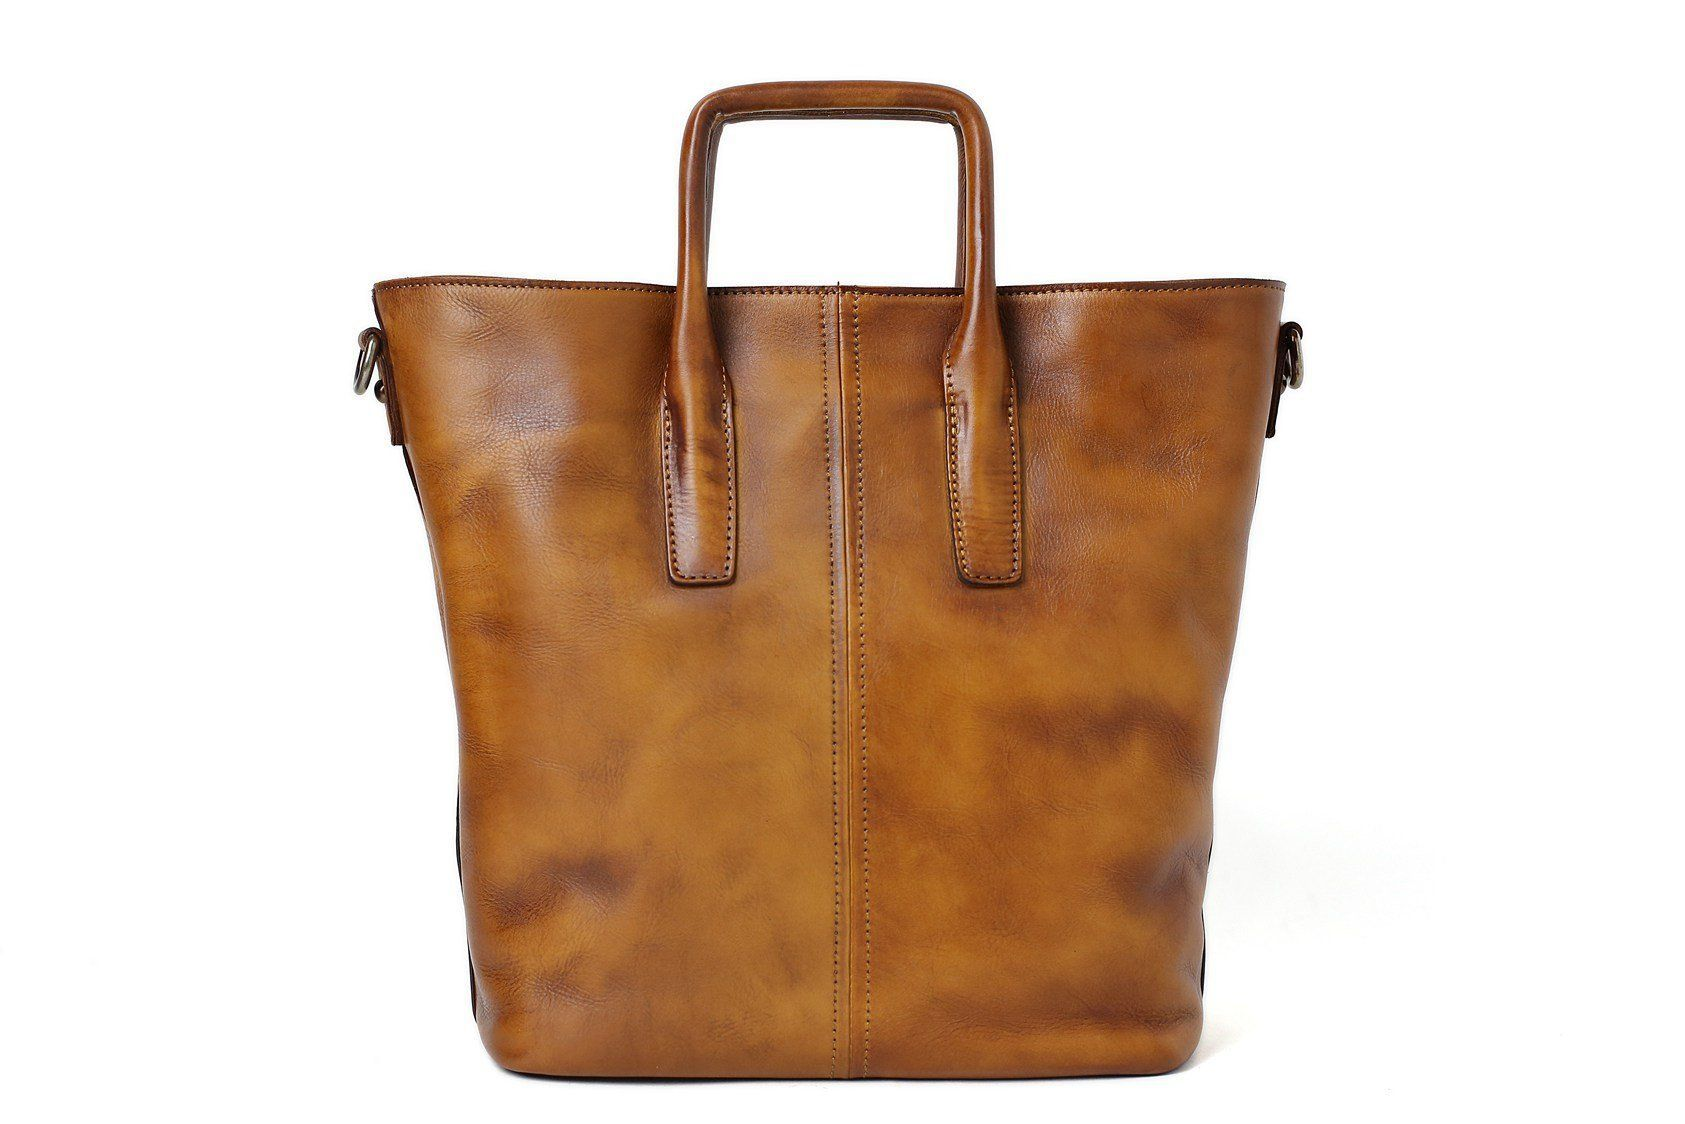 MoshiLeatherBag - Handmade Leather Bag Manufacturer — Handmade Full Grain  Leather Designer Handbag 5cd0f7dc473cc